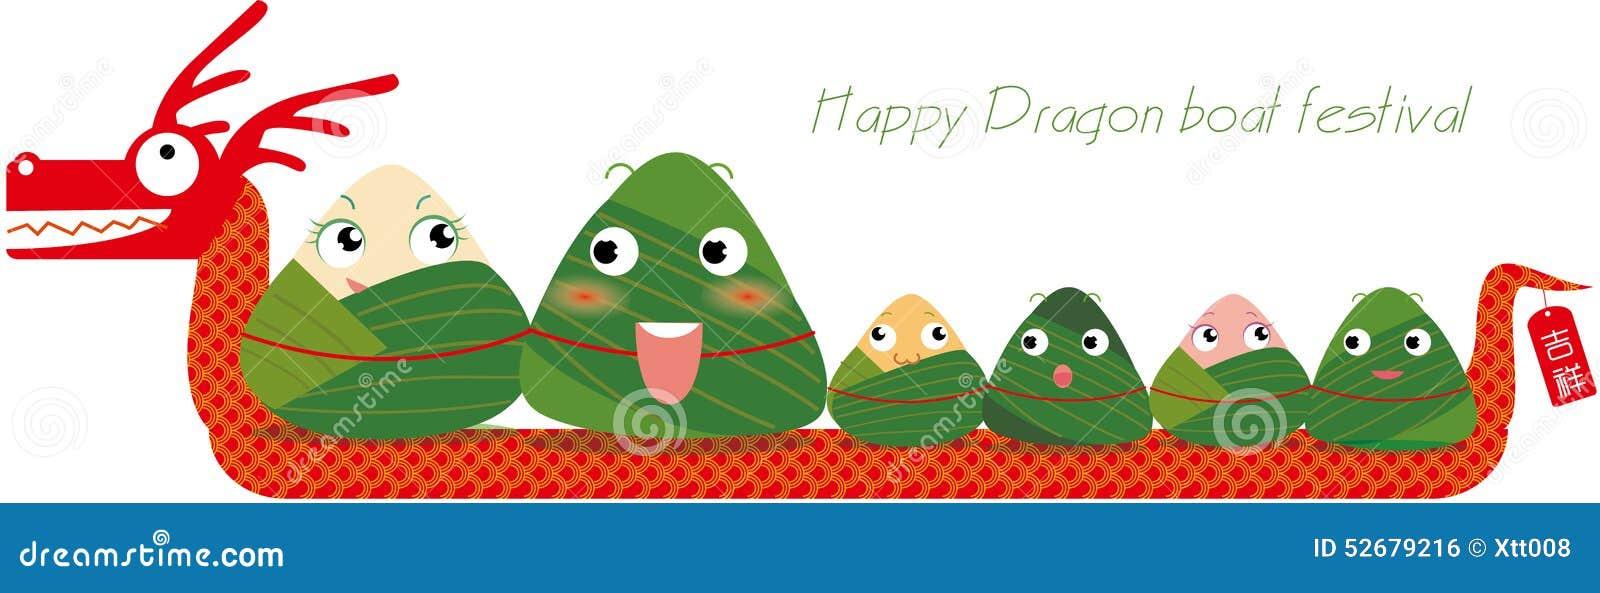 Chinese traditional festivals ,Dragon boat festival dumplings.